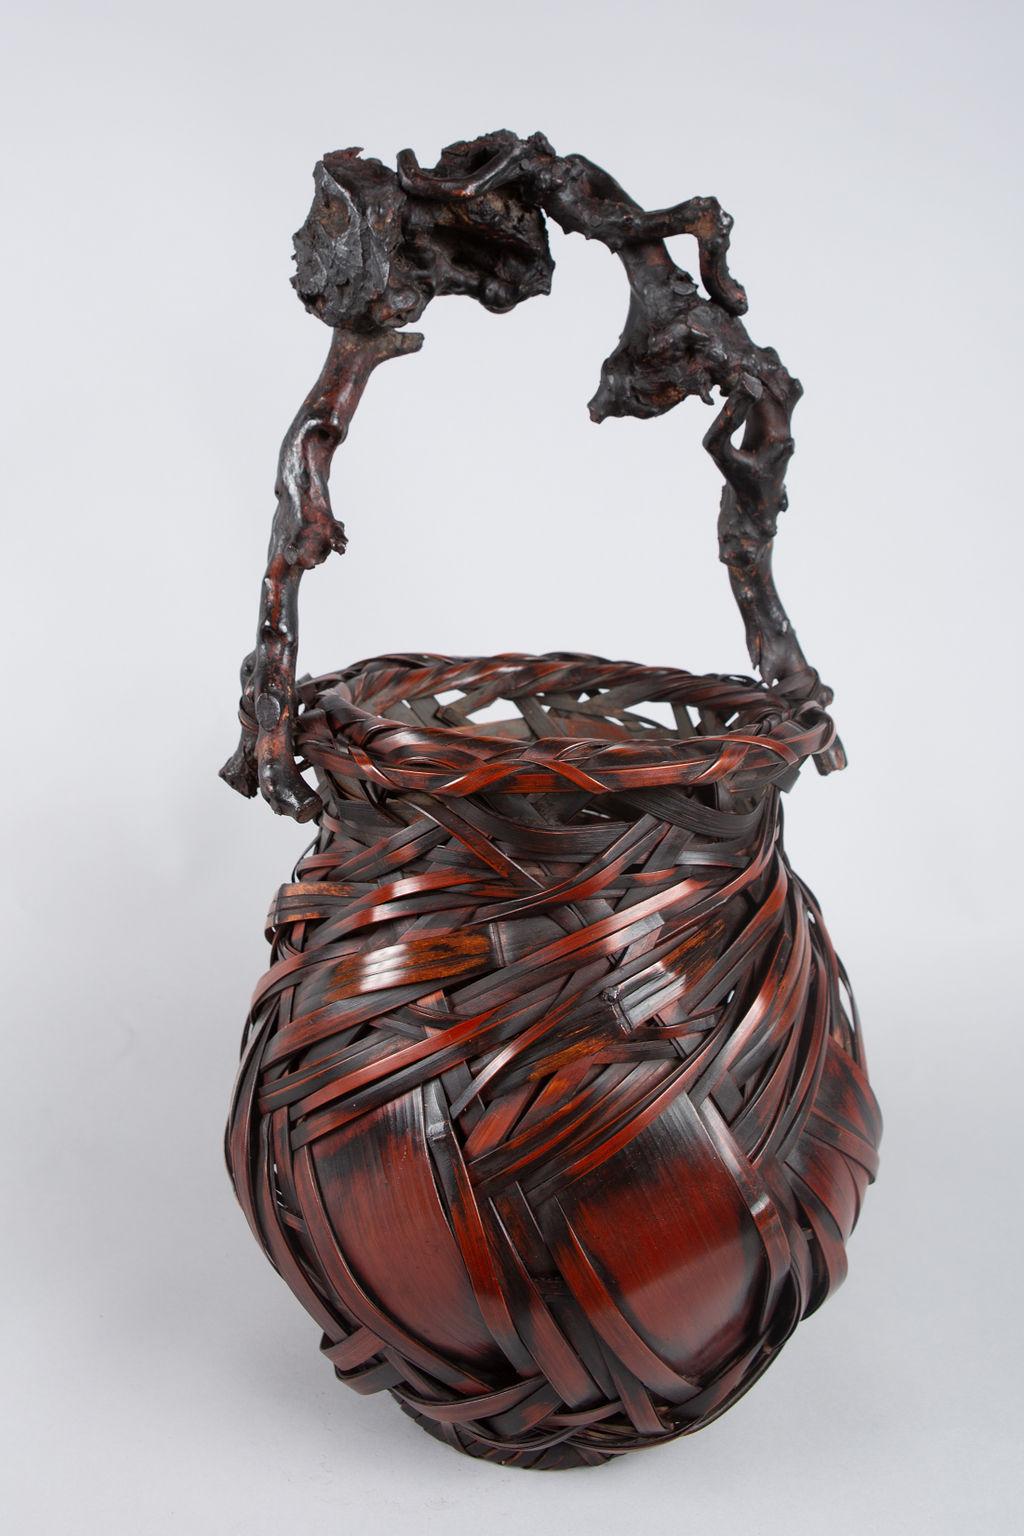 Japanese Antique Ikebana (Flower Arranging Basket)